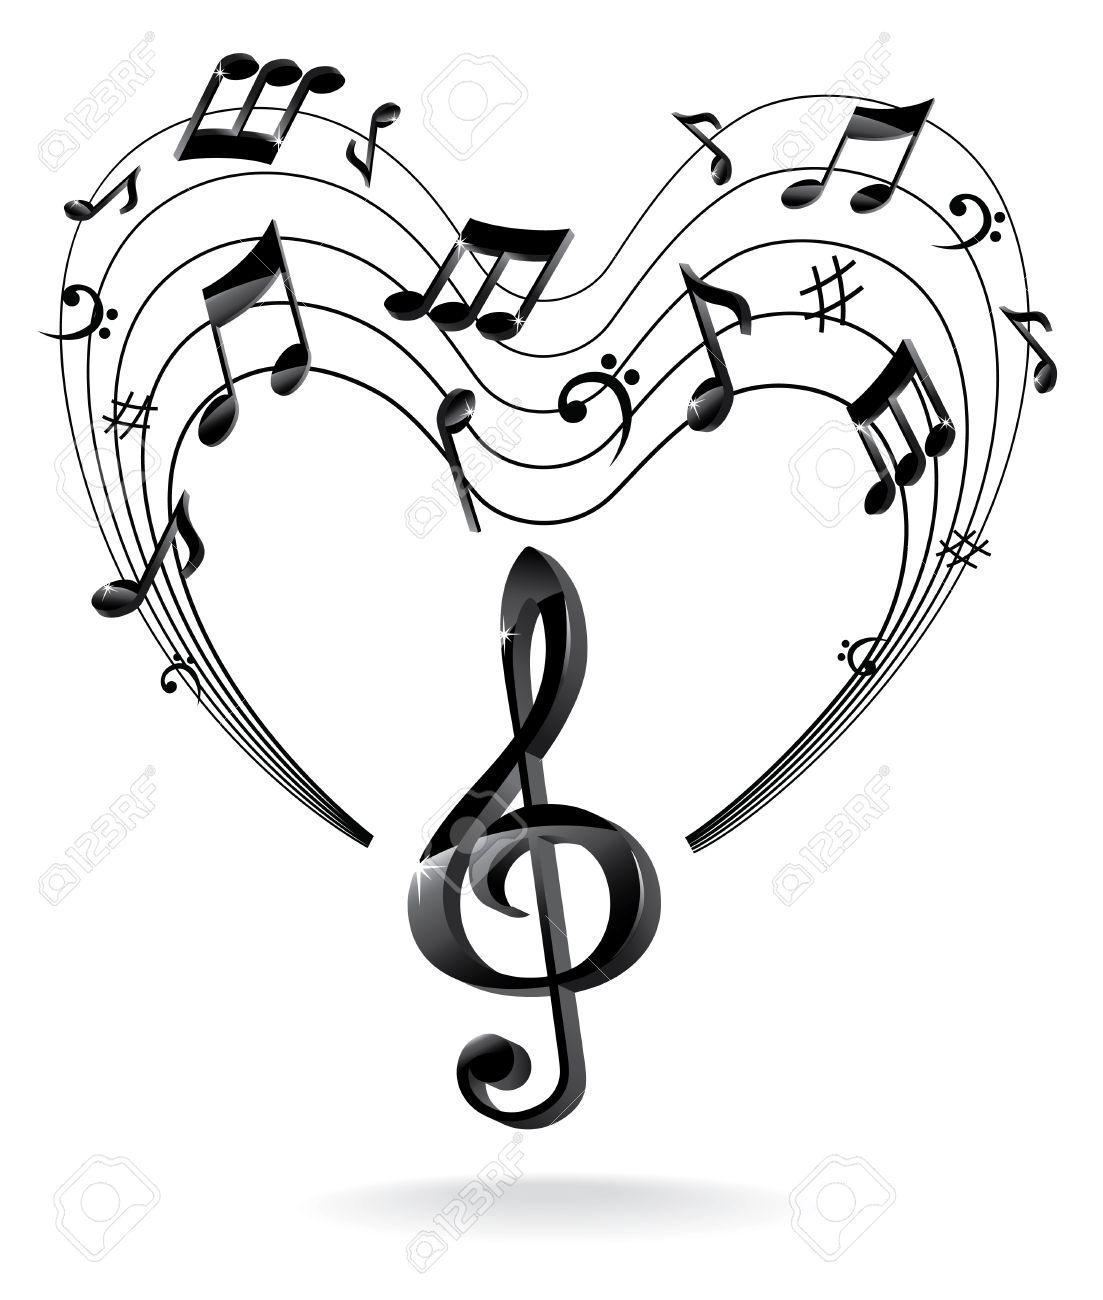 1103x1300 Music Notes Choir Clipart, Explore Pictures